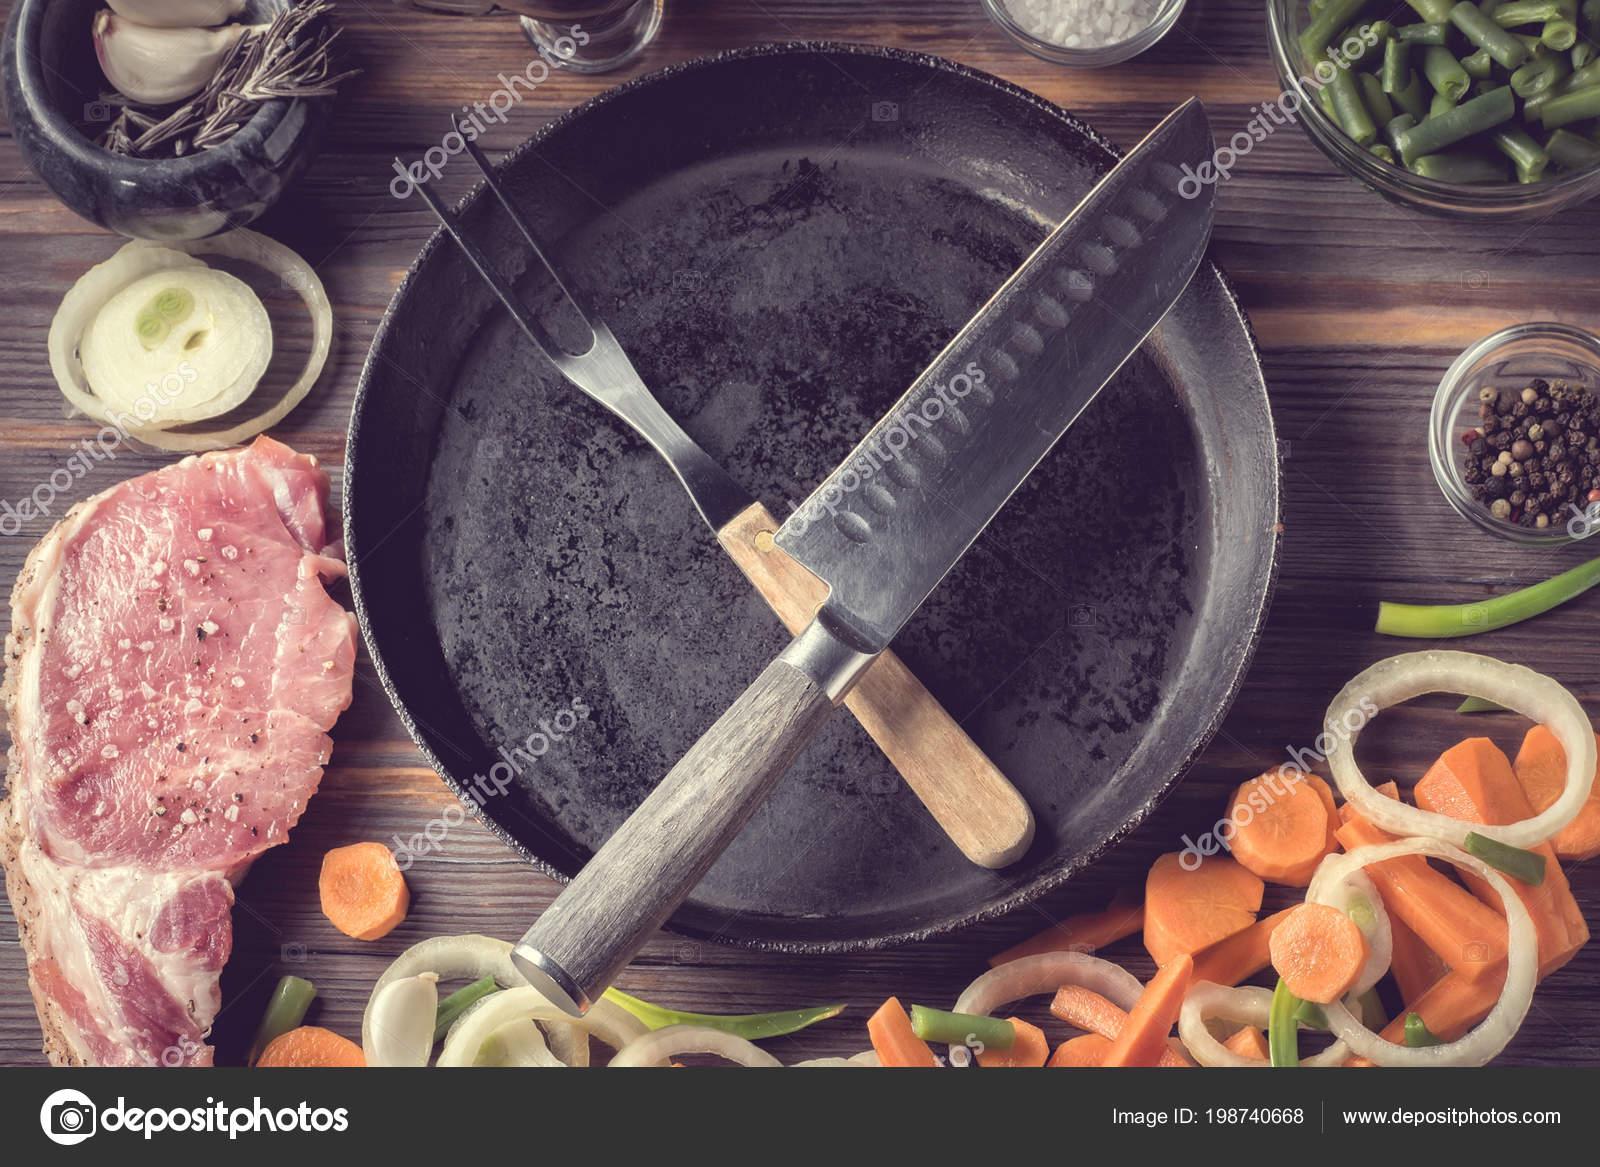 Set Products Ingredients Cooking Pork Steak Meat Veal Scraps